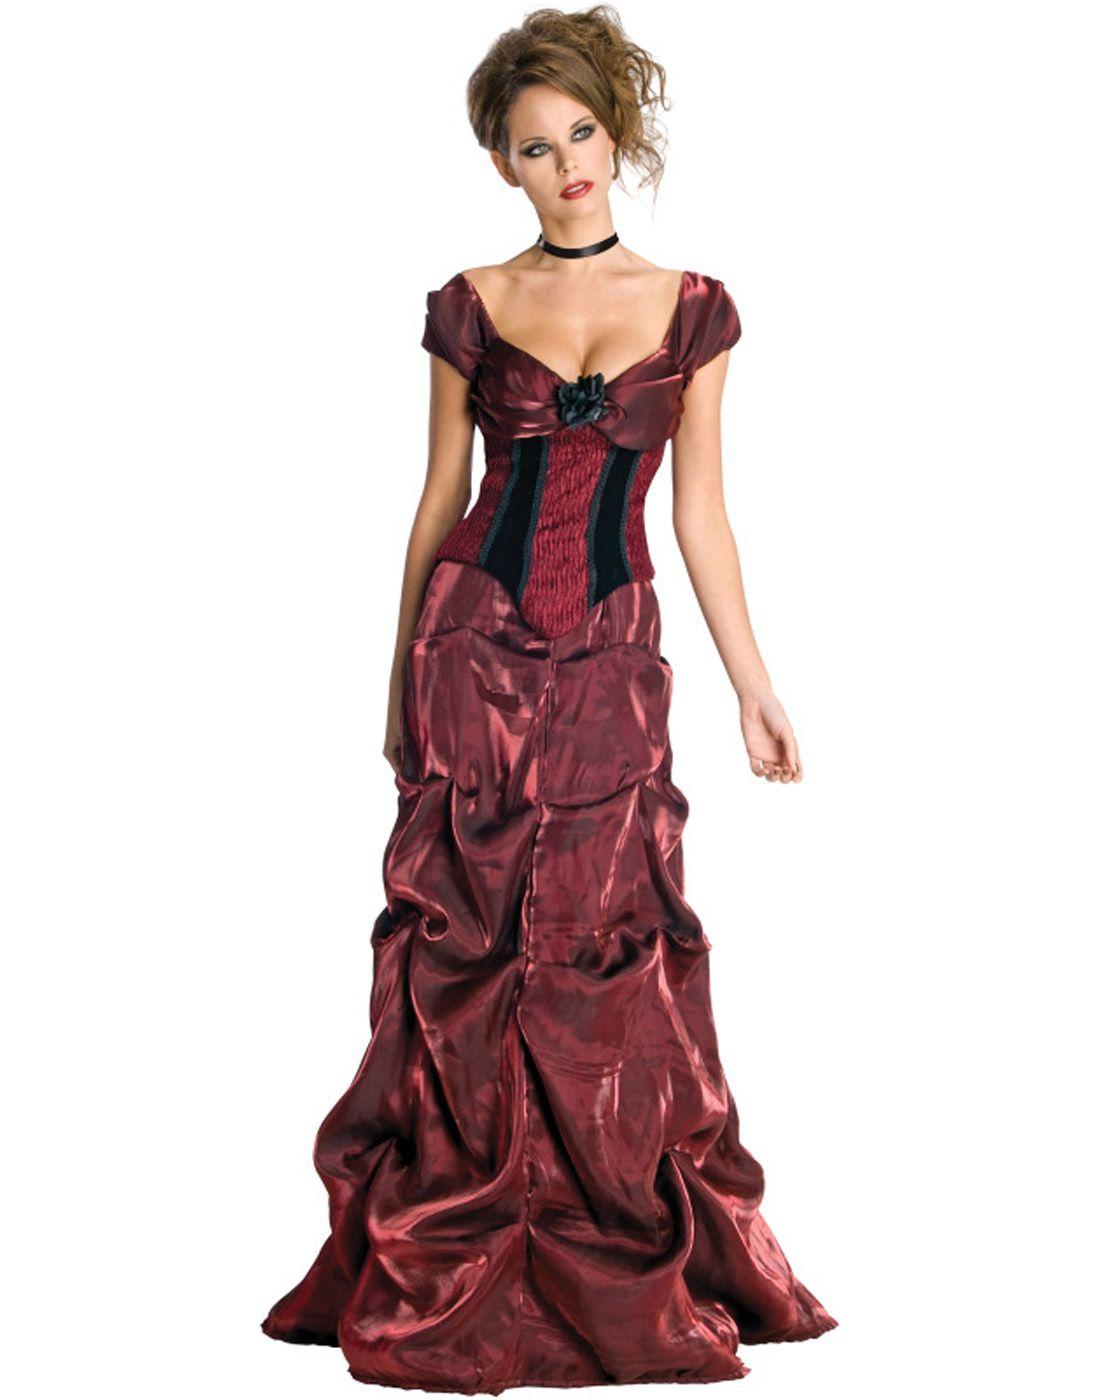 sexy victorian dress - Google Search | Victorian ...